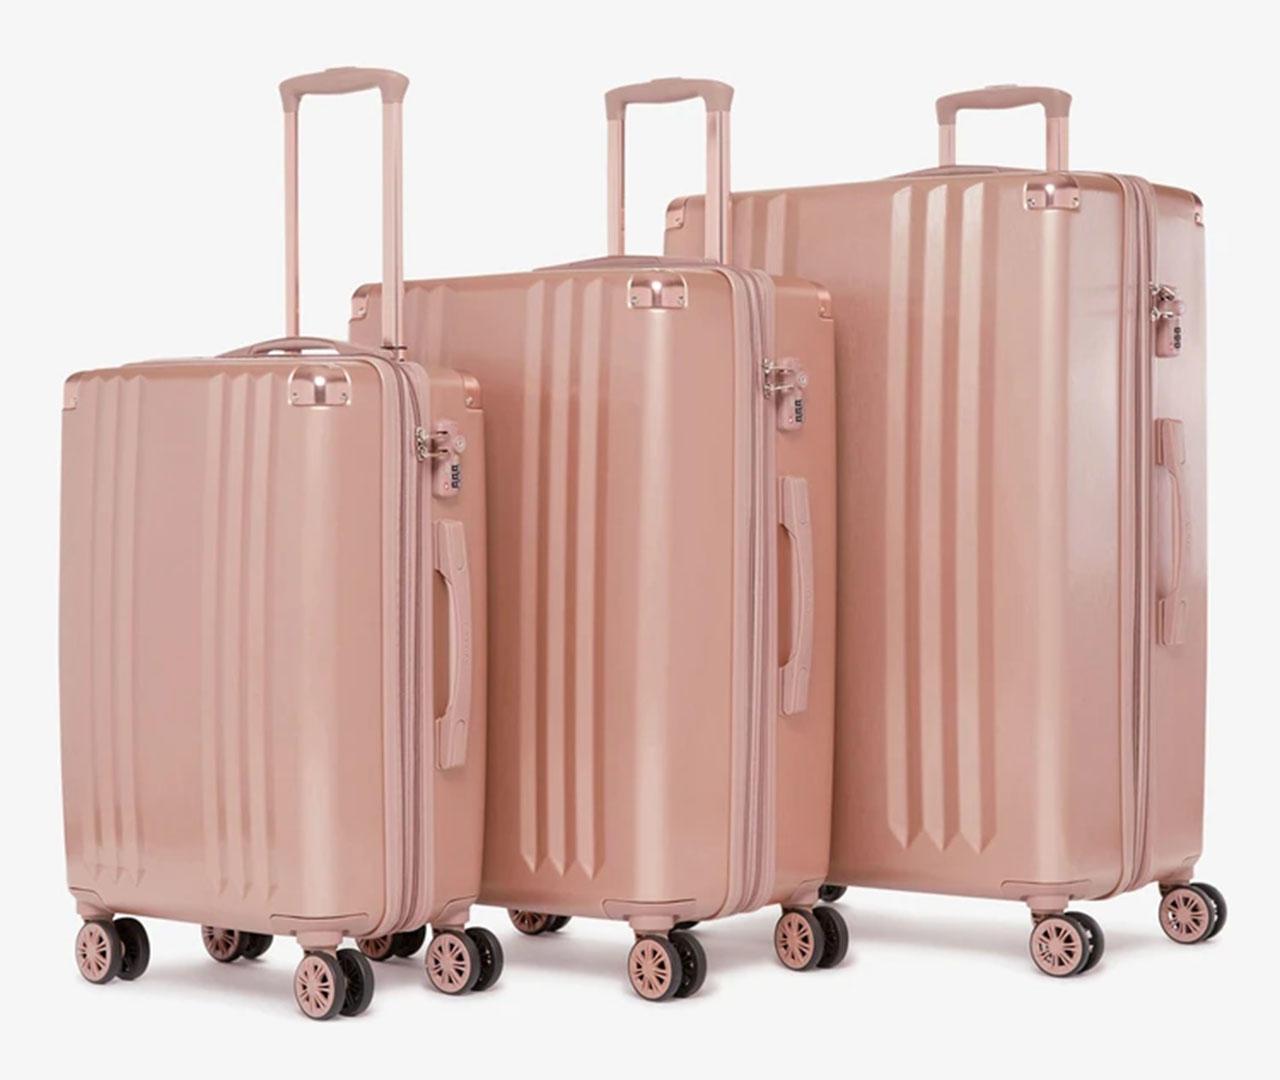 cbsnews-luggage-1.jpg